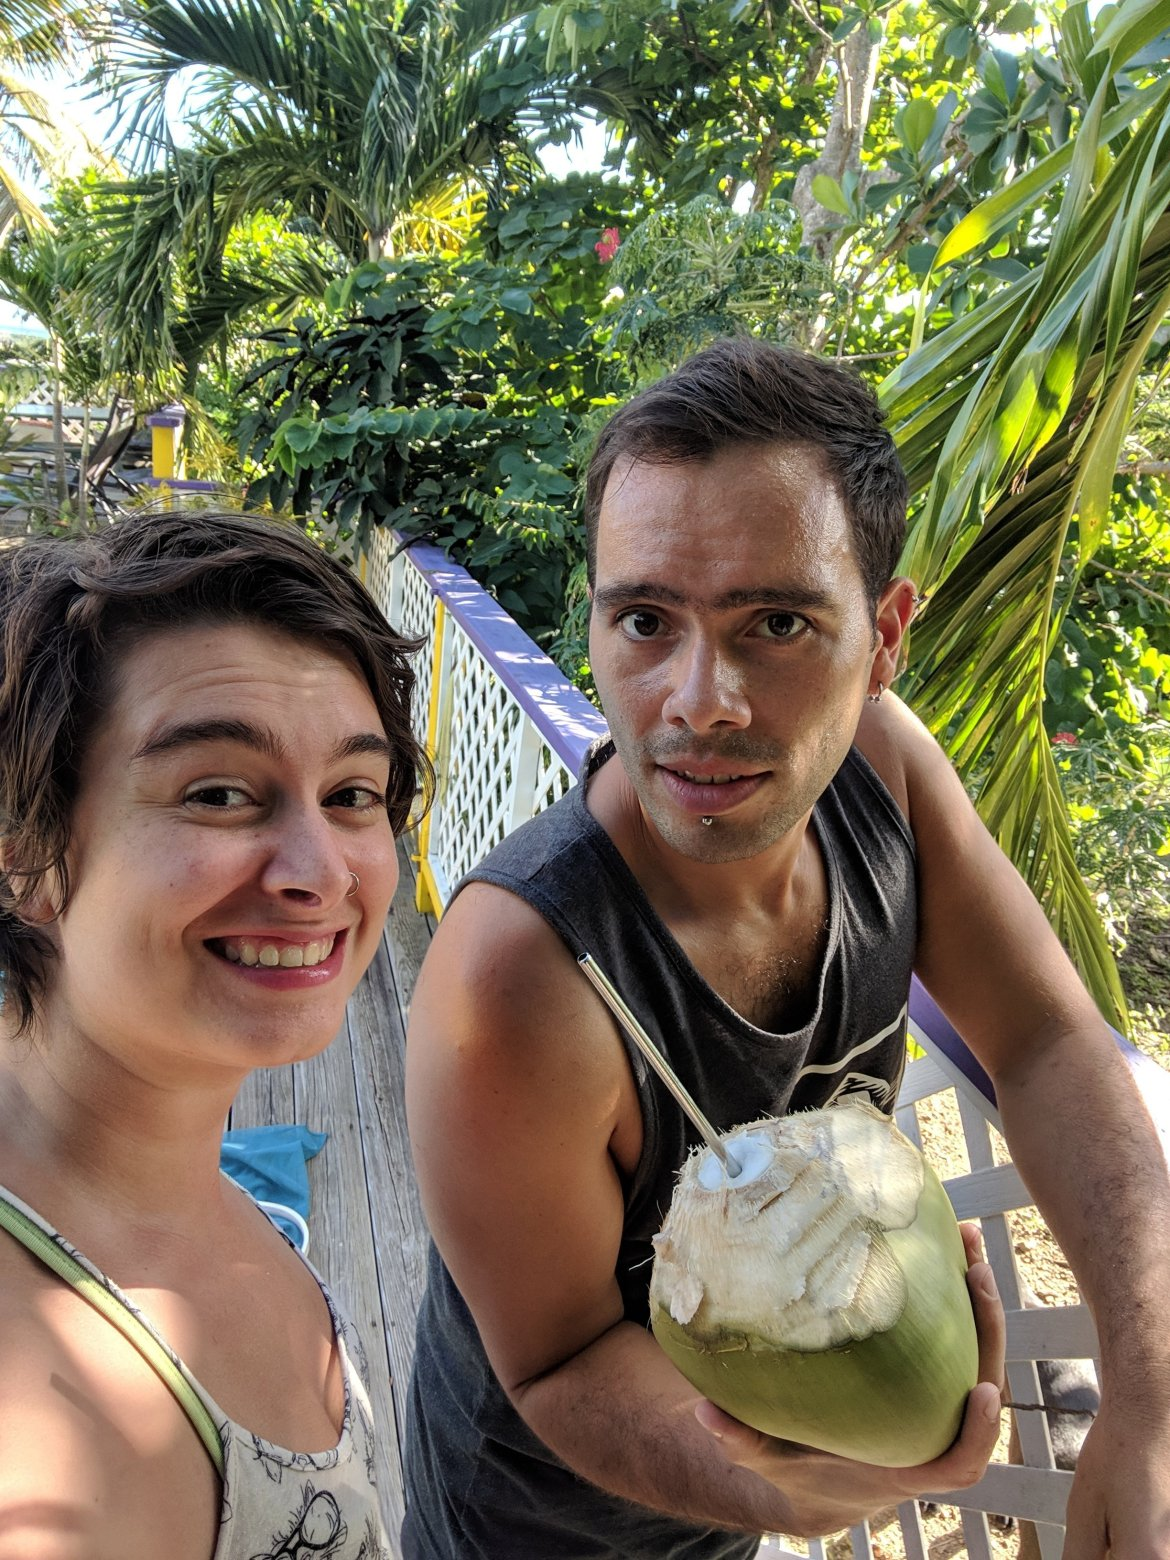 Sam and Veren: The Alternative Travelers